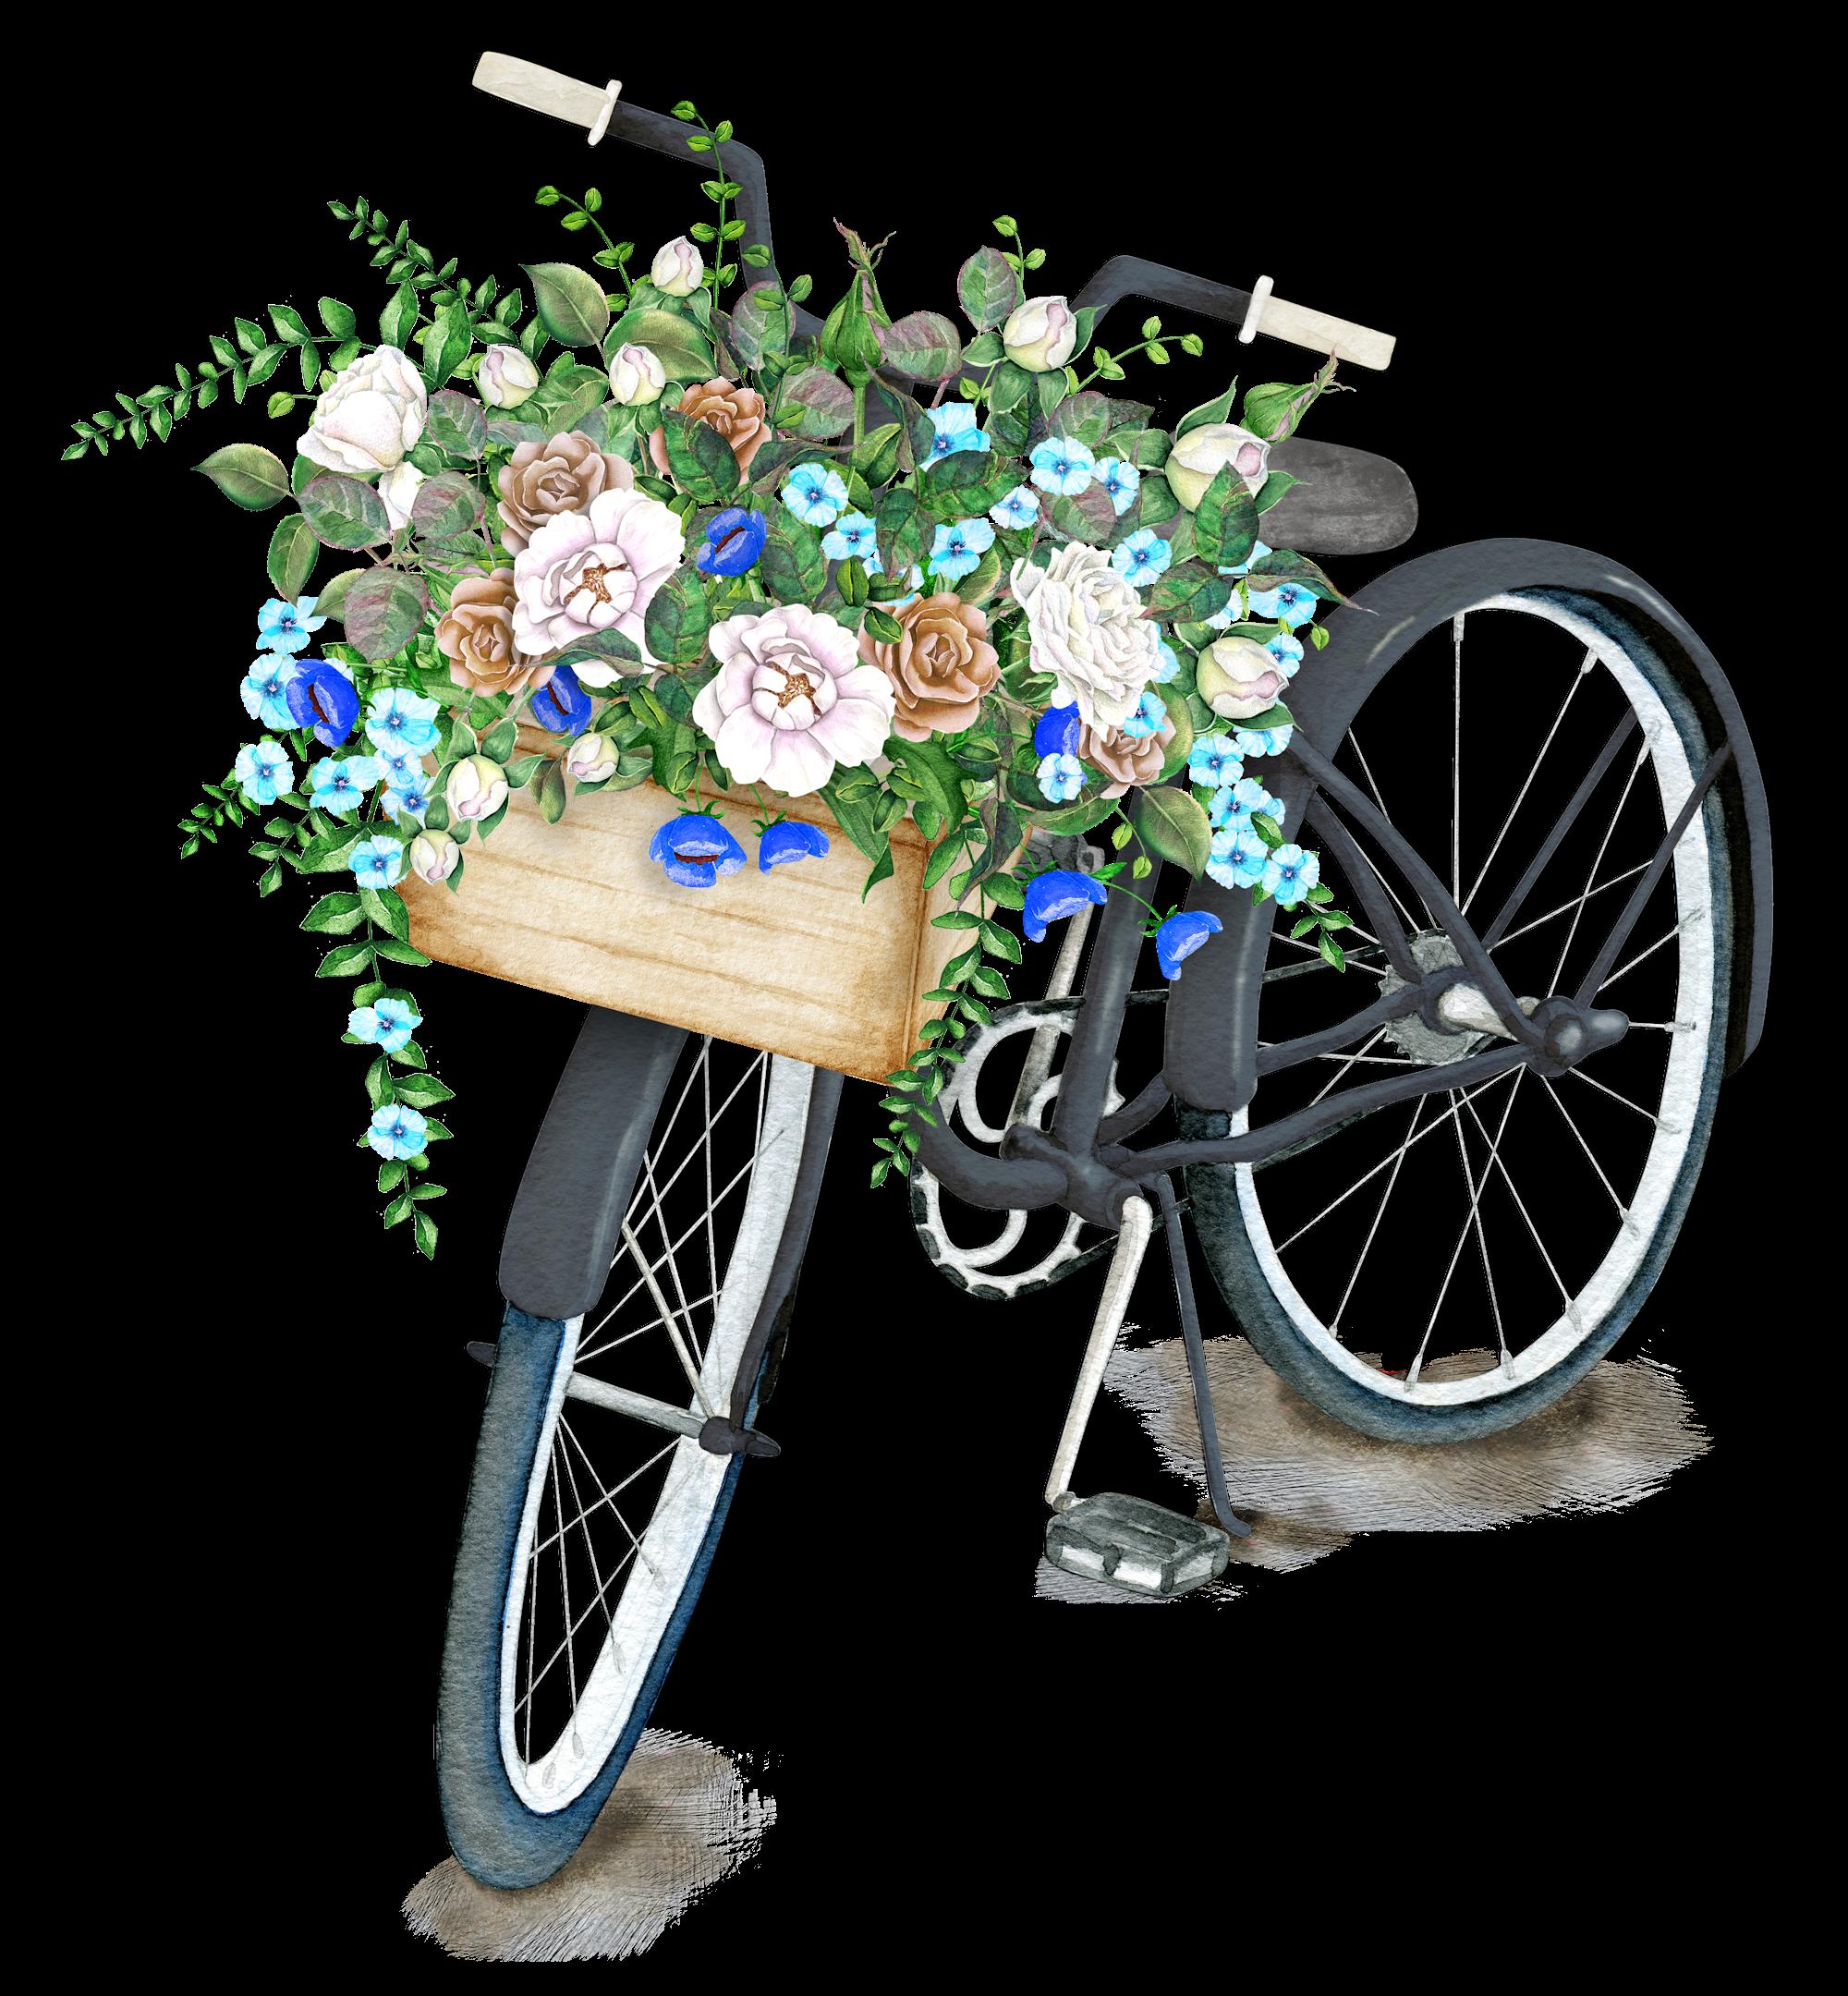 Bicycle with flower basket clipart clip art royalty free download Pin by Özen Ürkmez Kılıç on dekopaj resimleri | Pinterest | Flowers ... clip art royalty free download